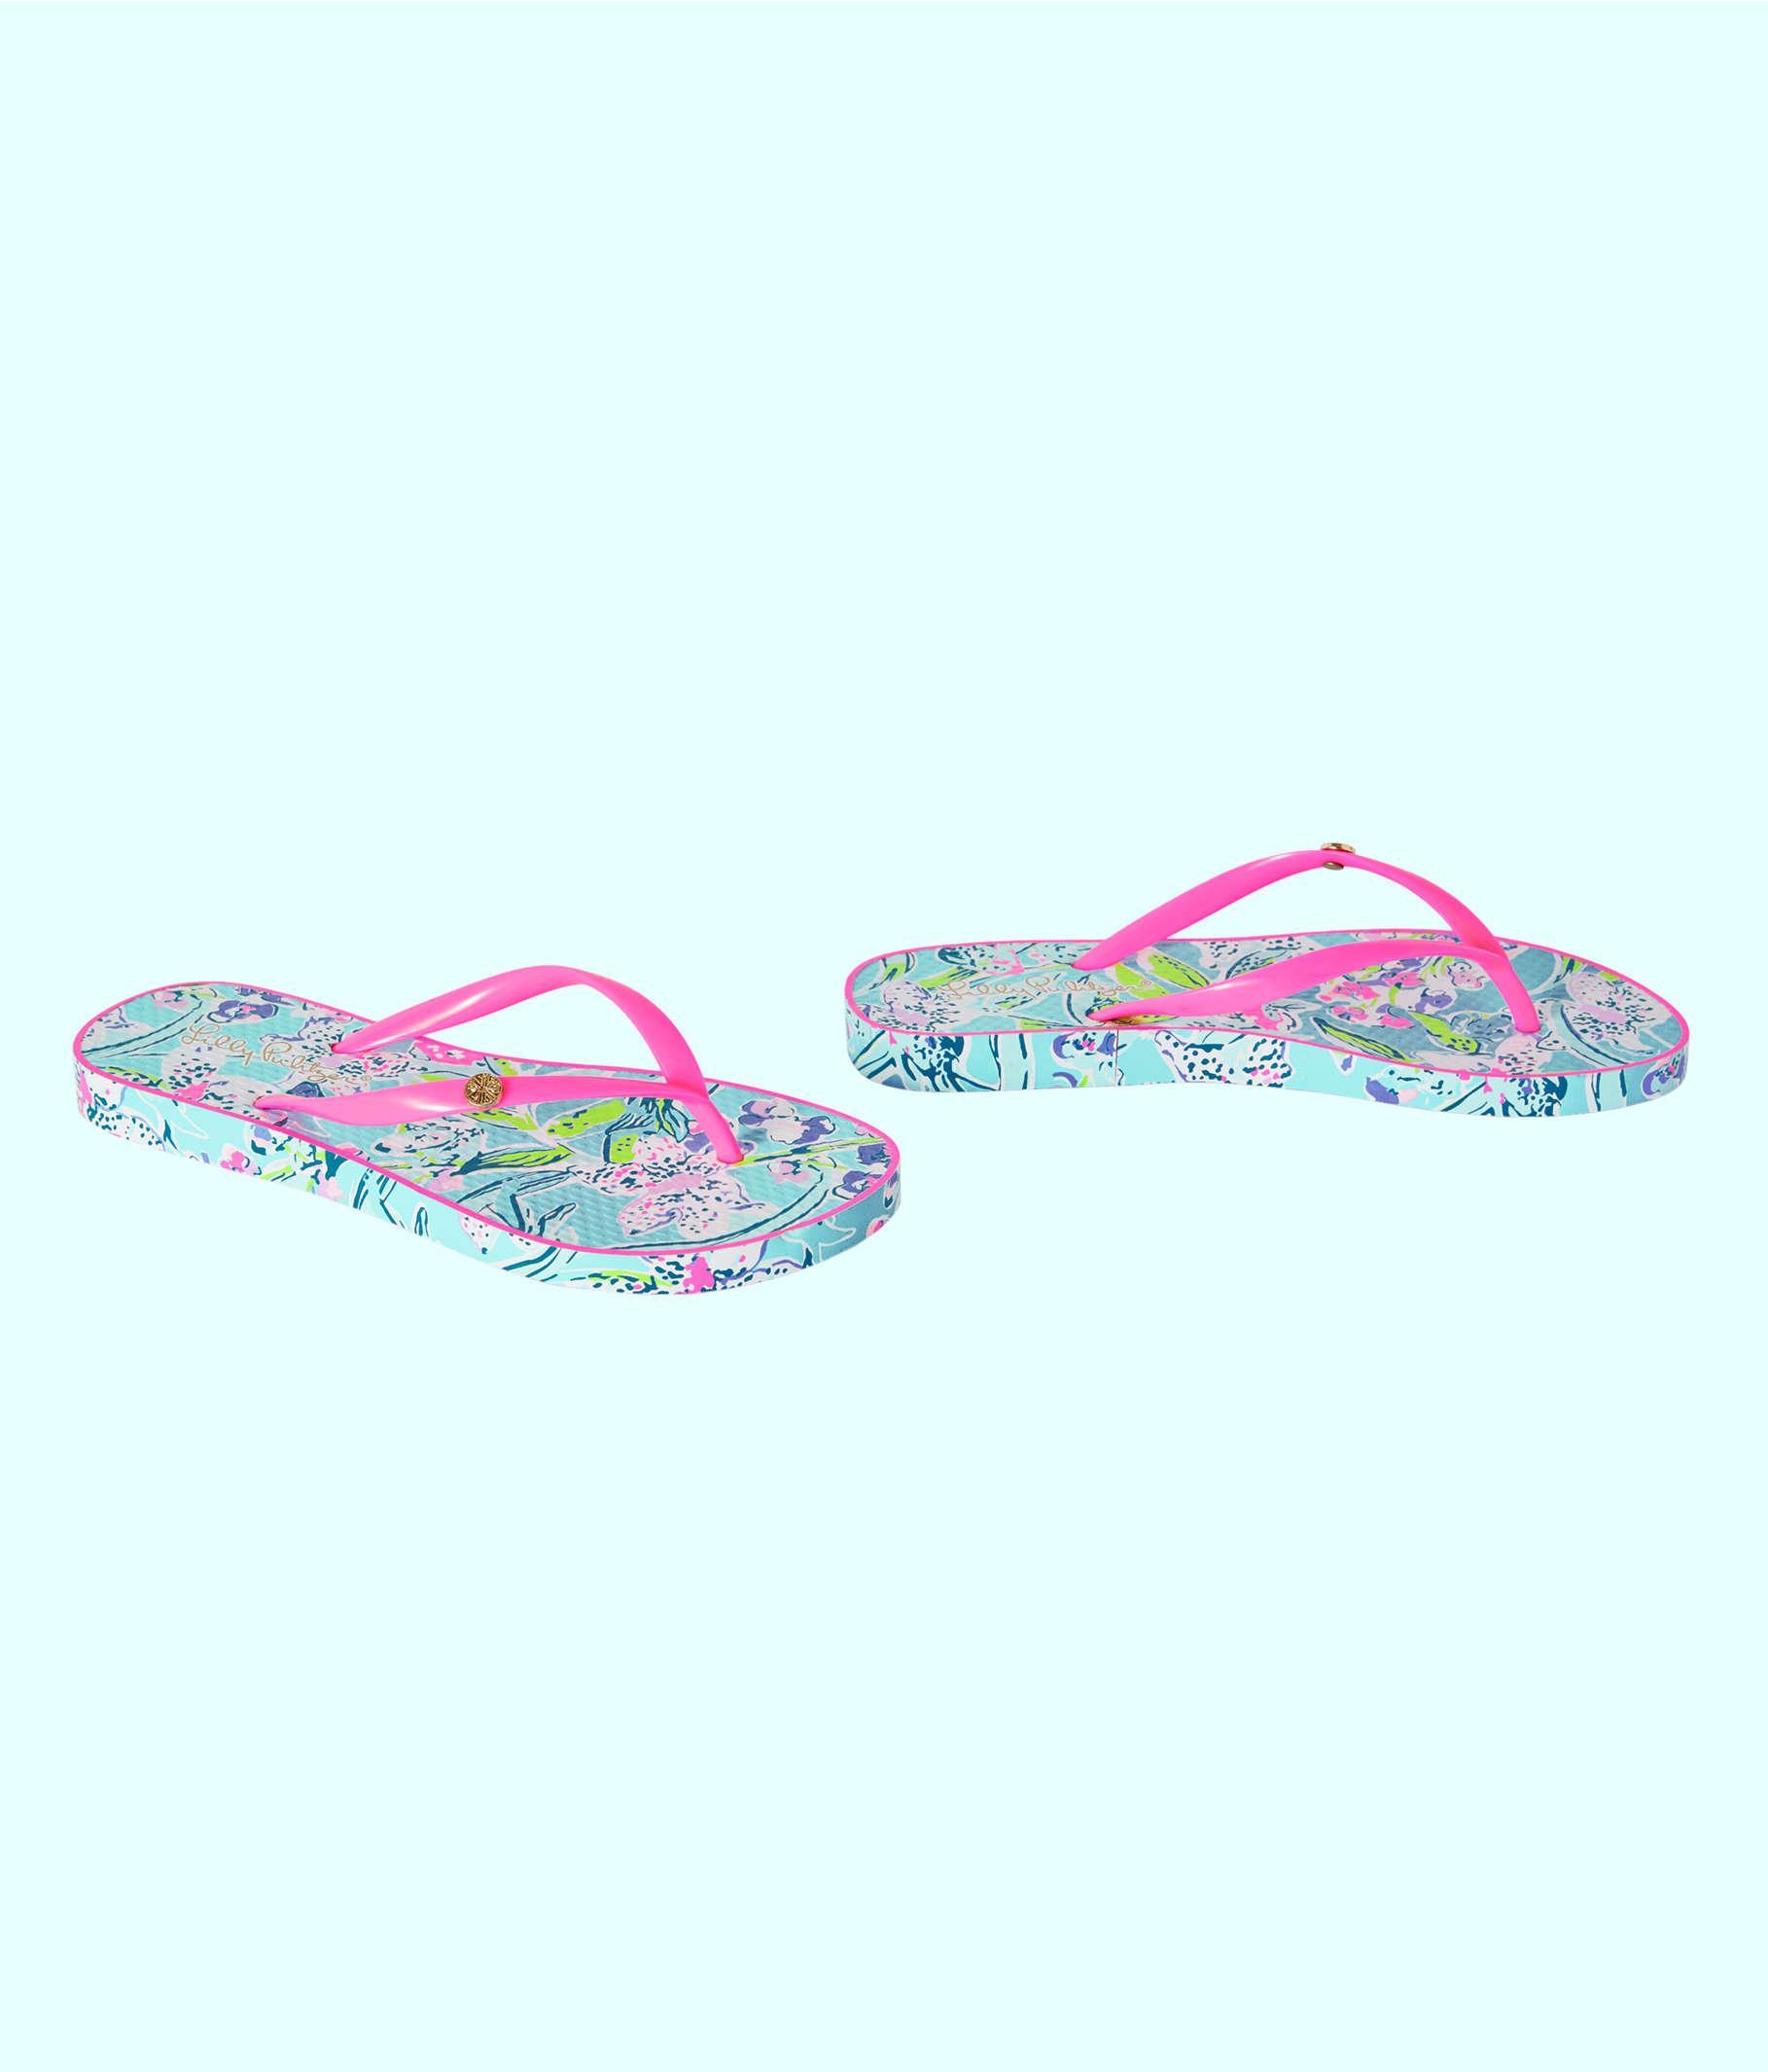 595e4e0cdba Lyst - Lilly Pulitzer Pool Flip Flop in Blue